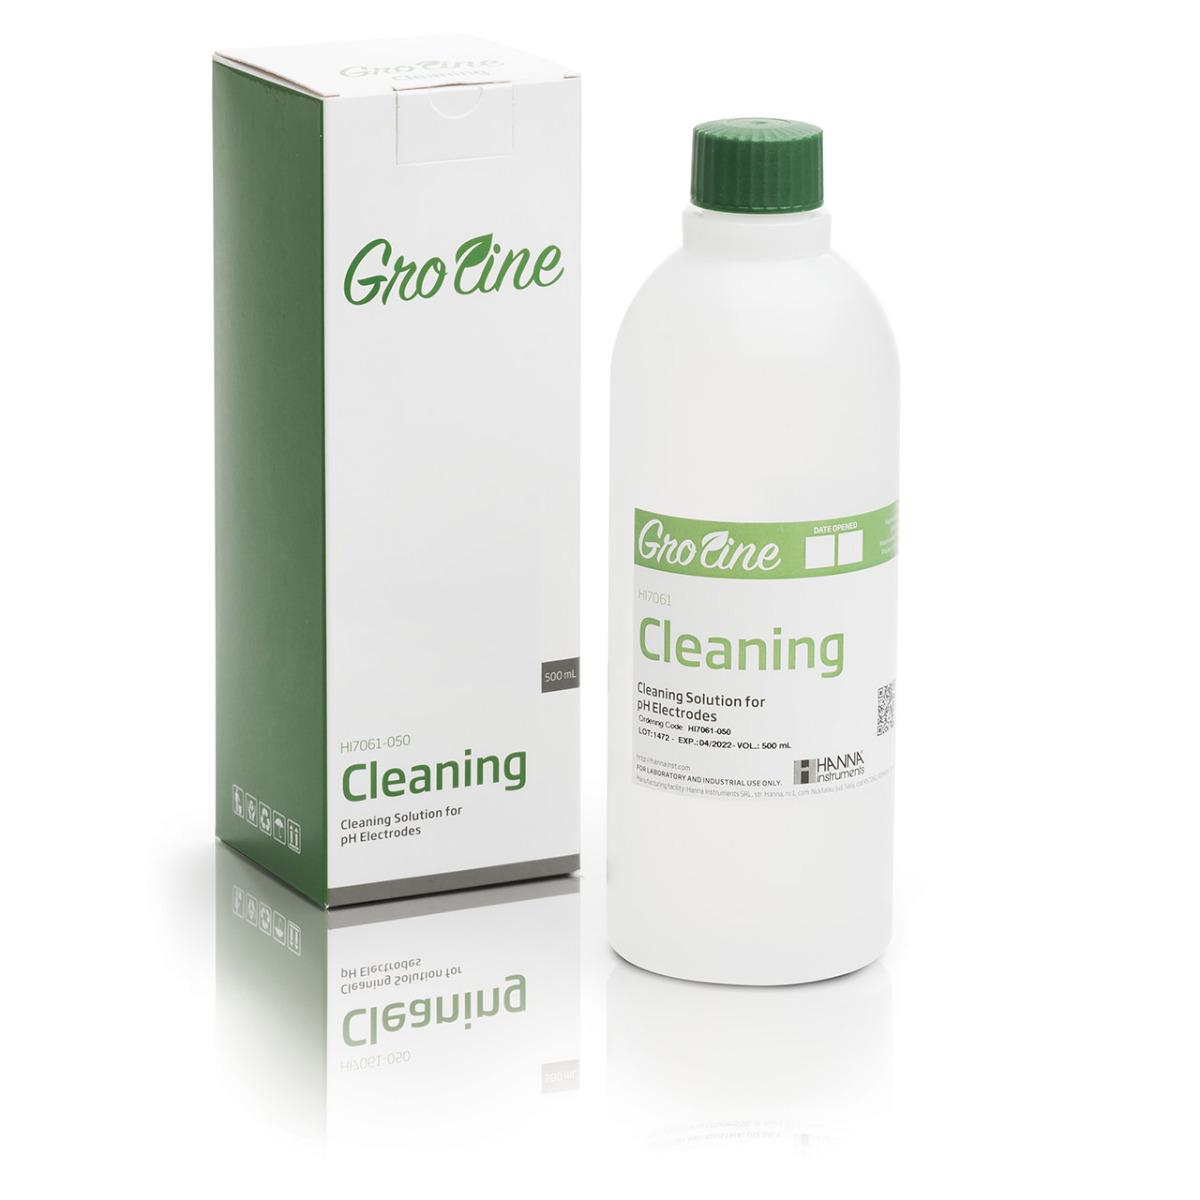 HI7061-050 GroLine General Purpose Cleaning Solution (500 mL)